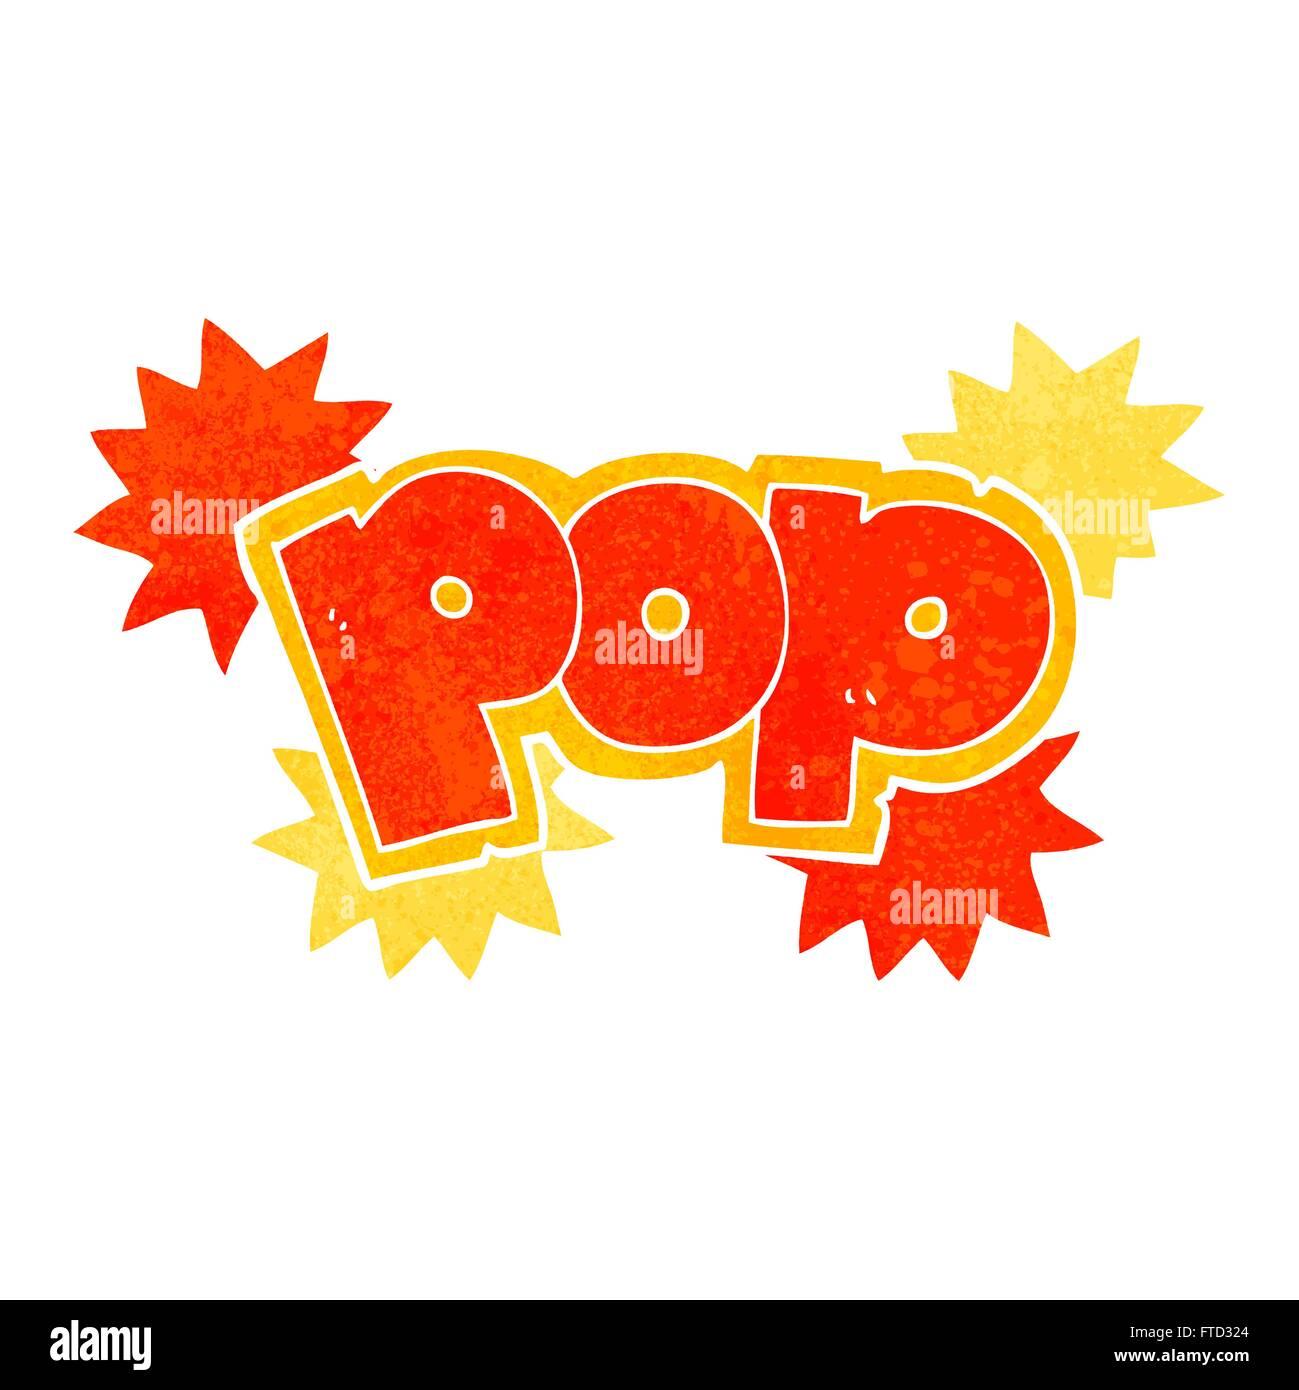 Freehand retro cartoon pop explosion symbol stock vector art freehand retro cartoon pop explosion symbol buycottarizona